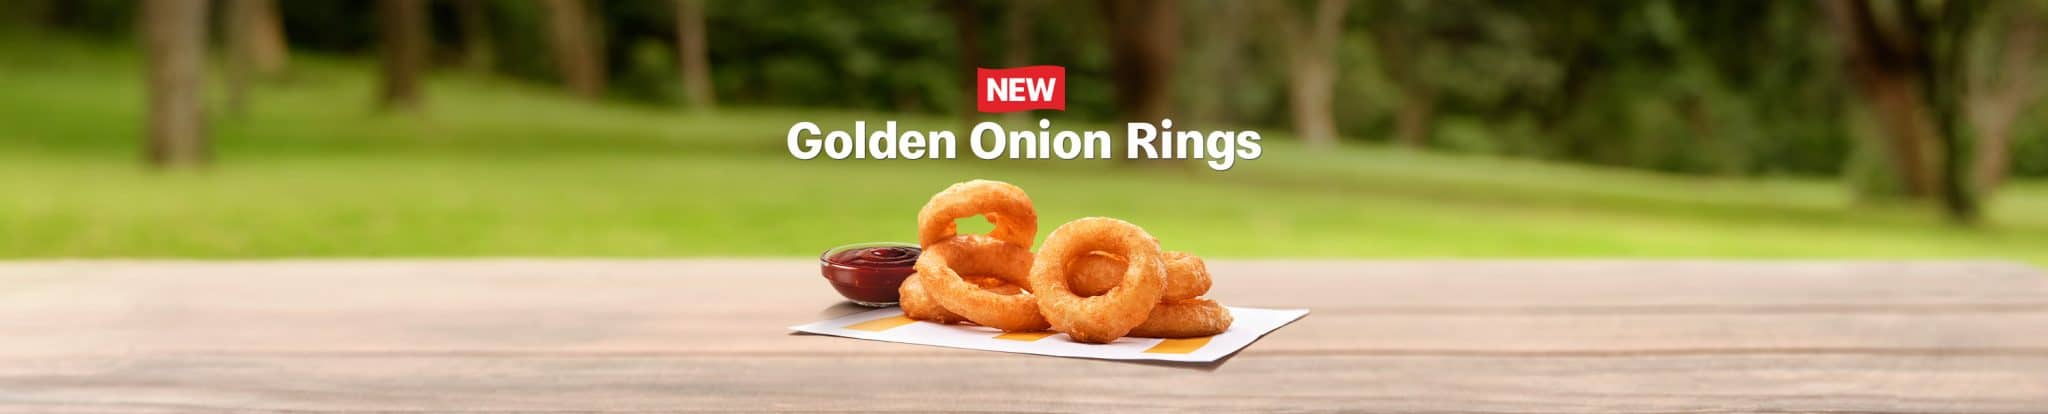 McDonald's Golden Onion Rings